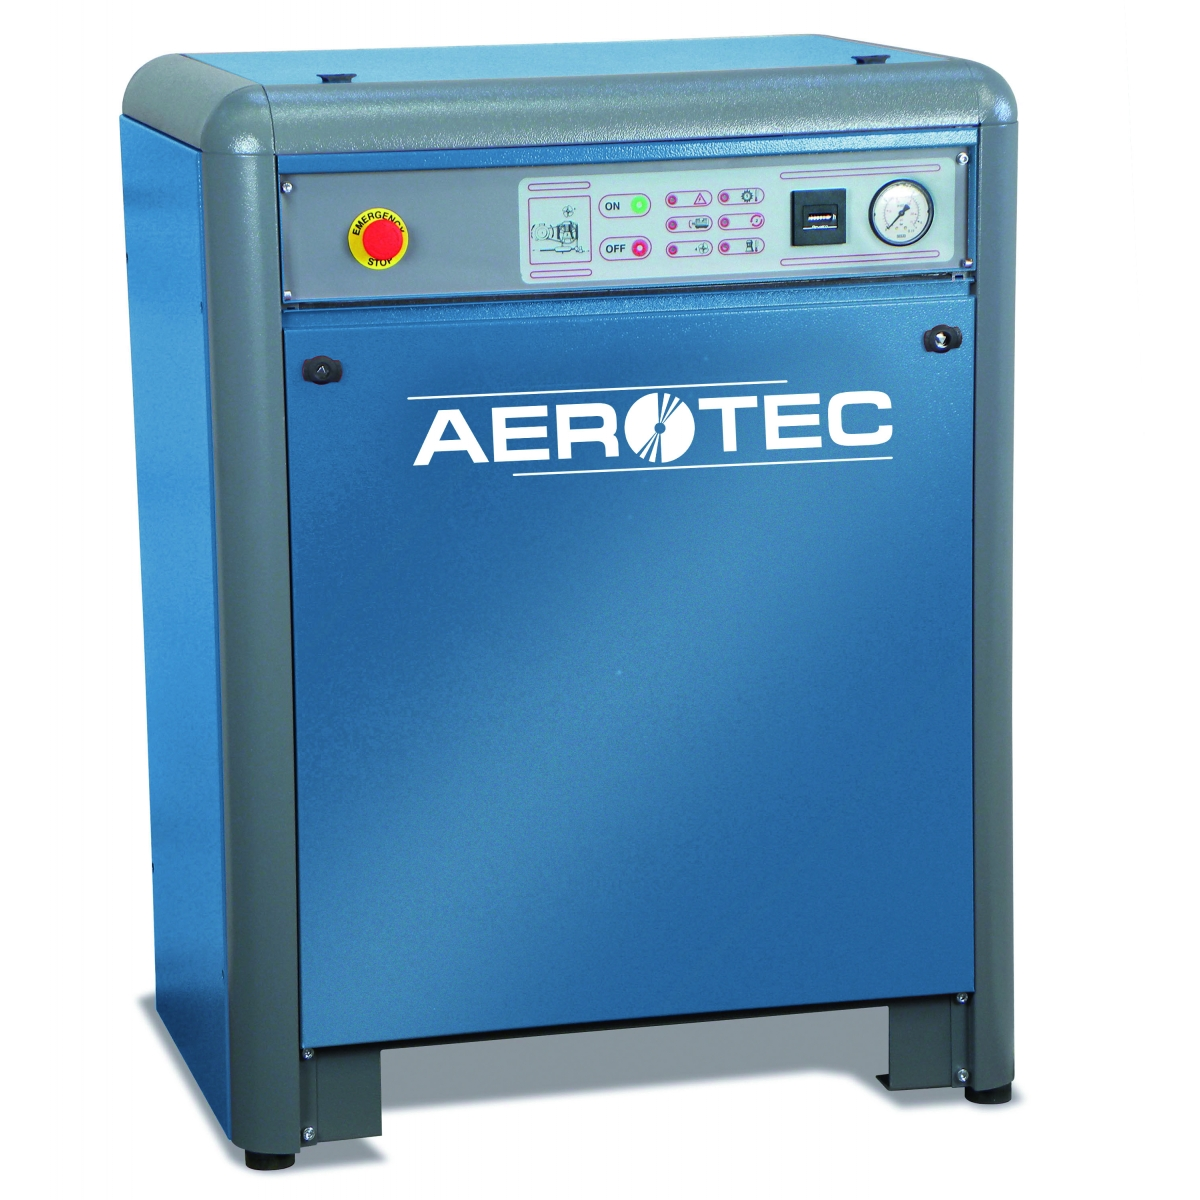 Aerotec Silent Basis Pro B Ak30 10 Beisteller Keilriemenkompressor 4 Kw 10 Bar